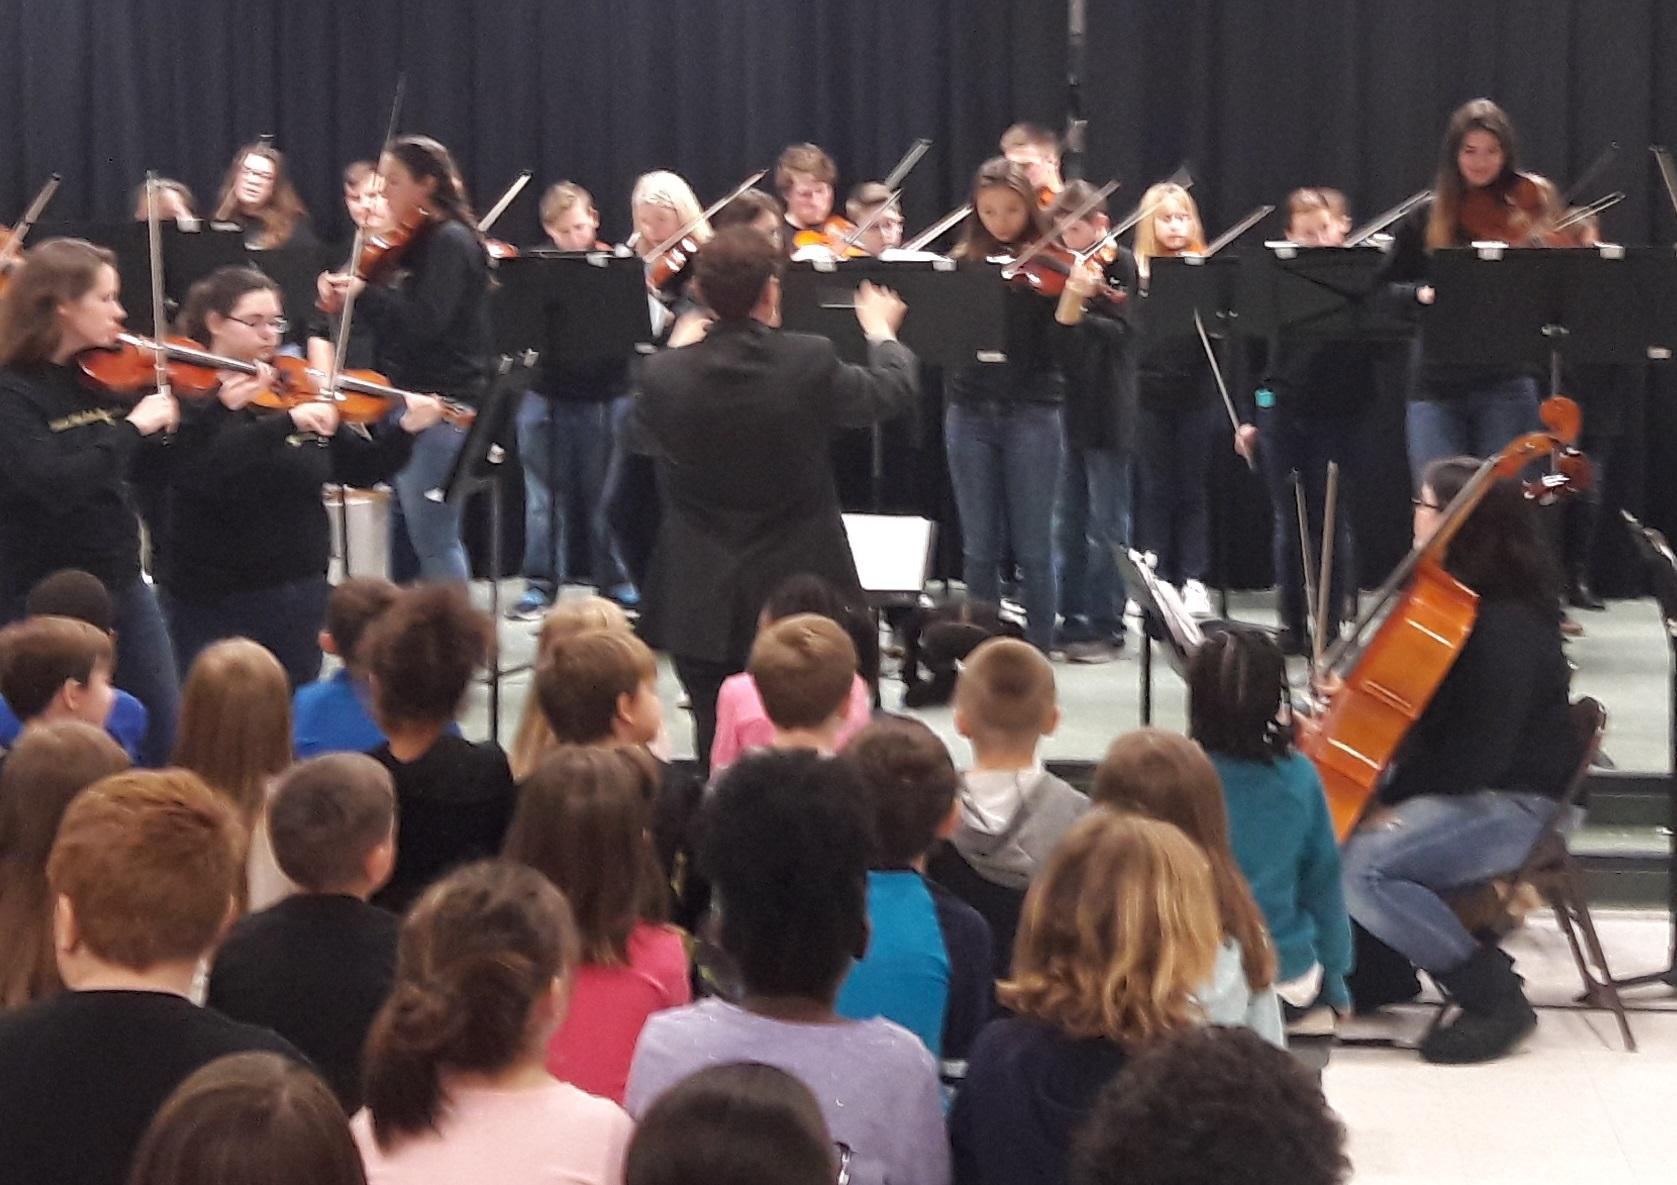 Orchestra Performance at Verner